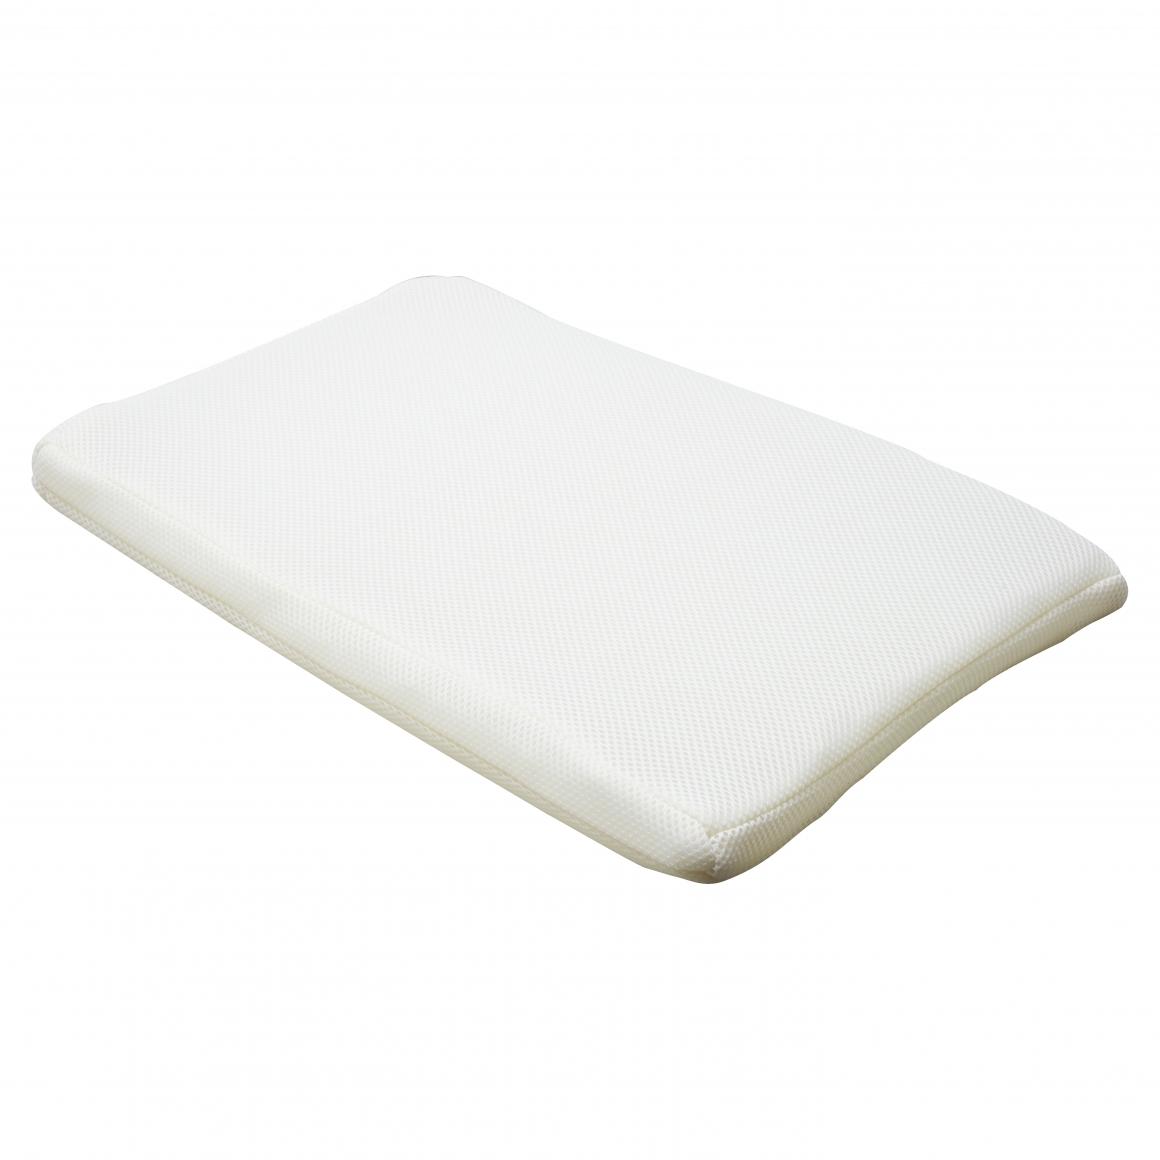 301-4002 Q絲趴枕枕心(中層布套)-1